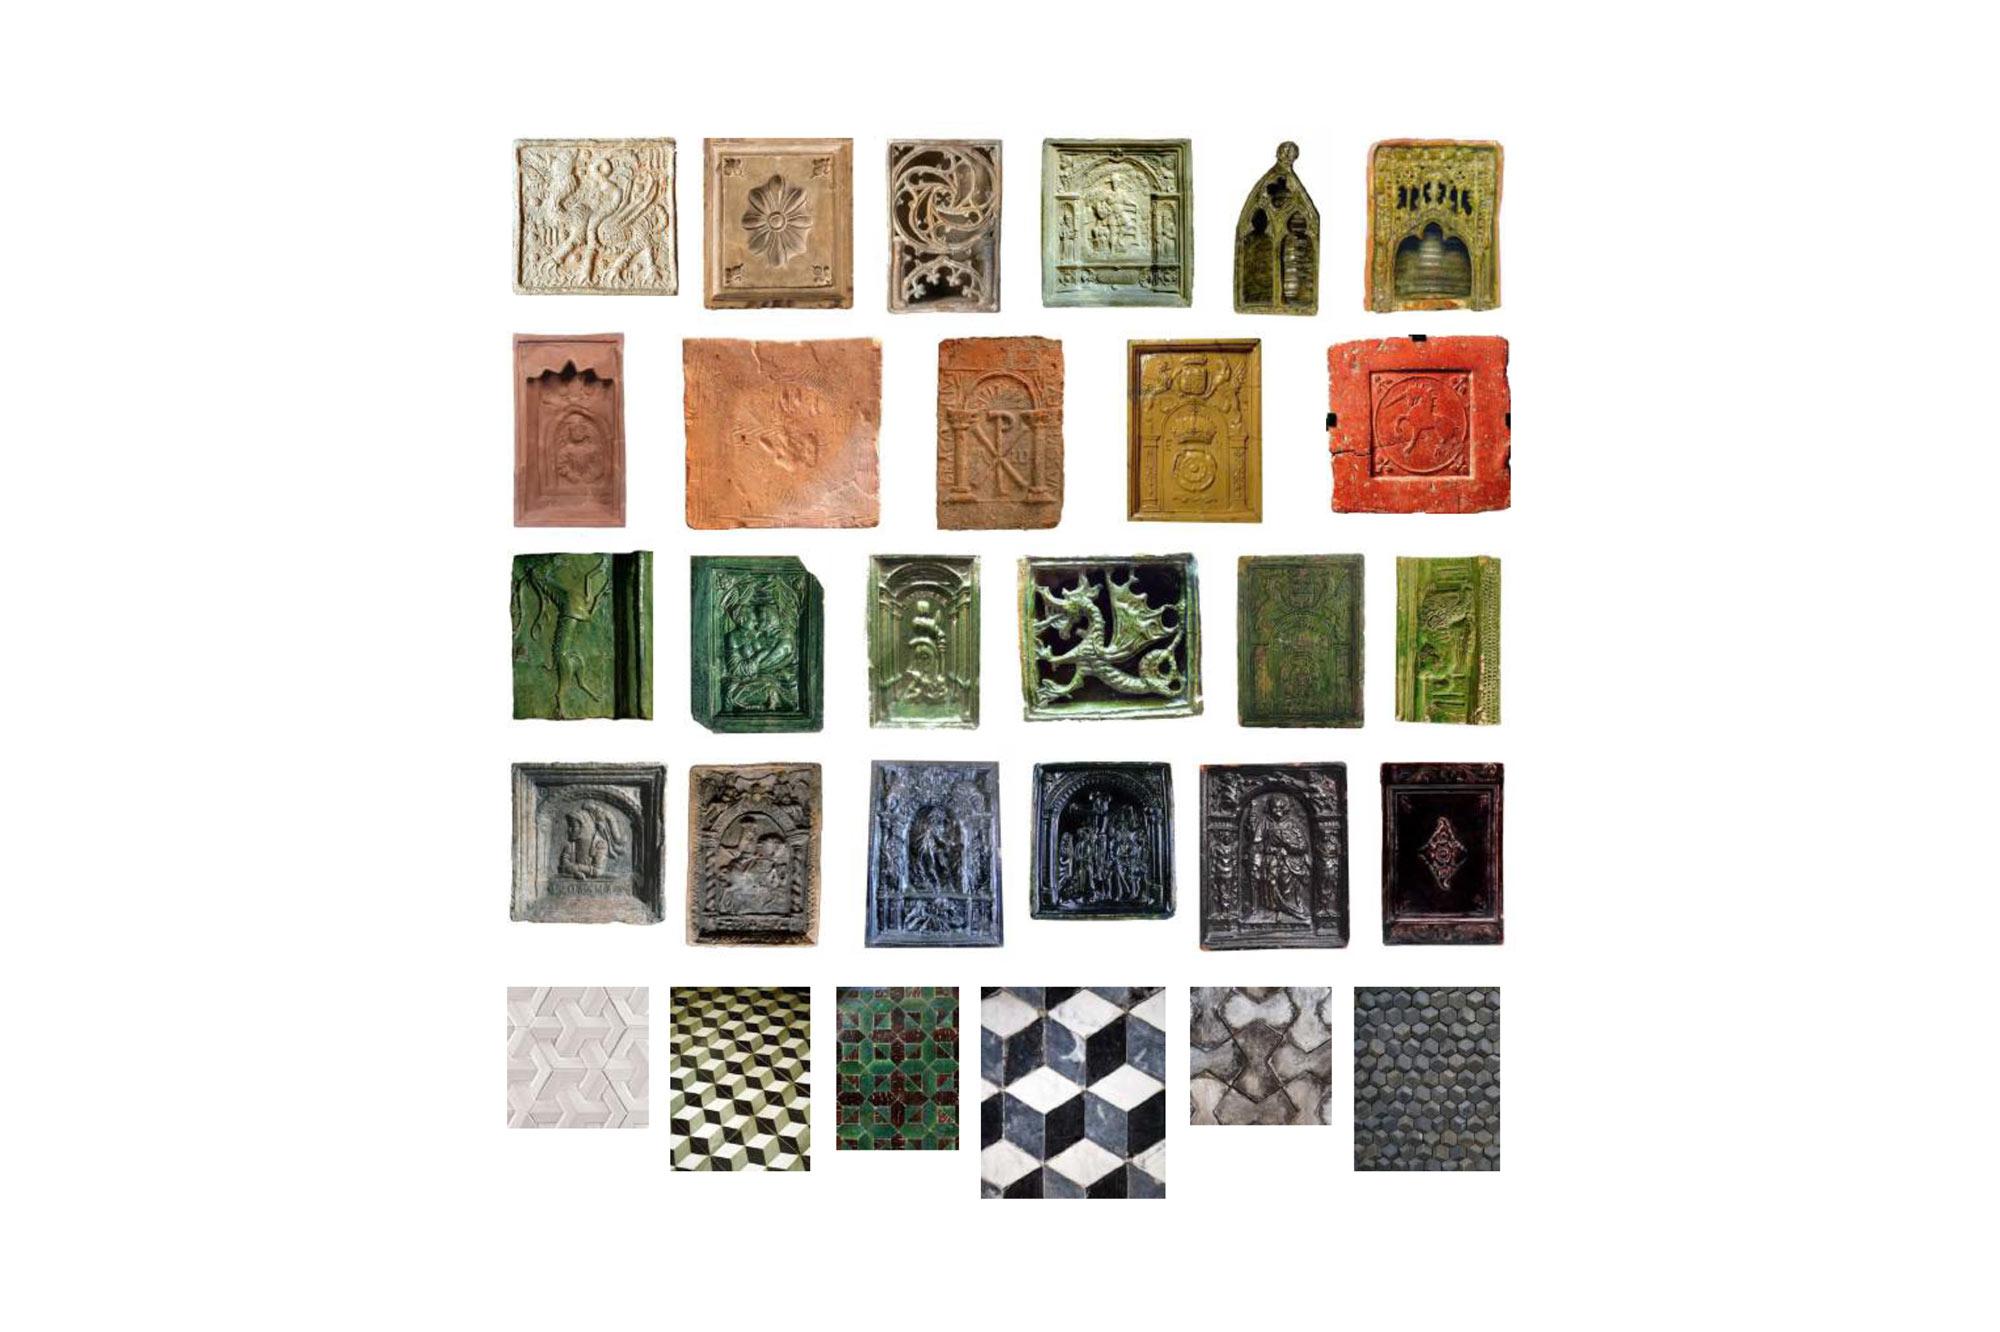 cube-haus-skene-catling-architects-cs-2000×1332-14